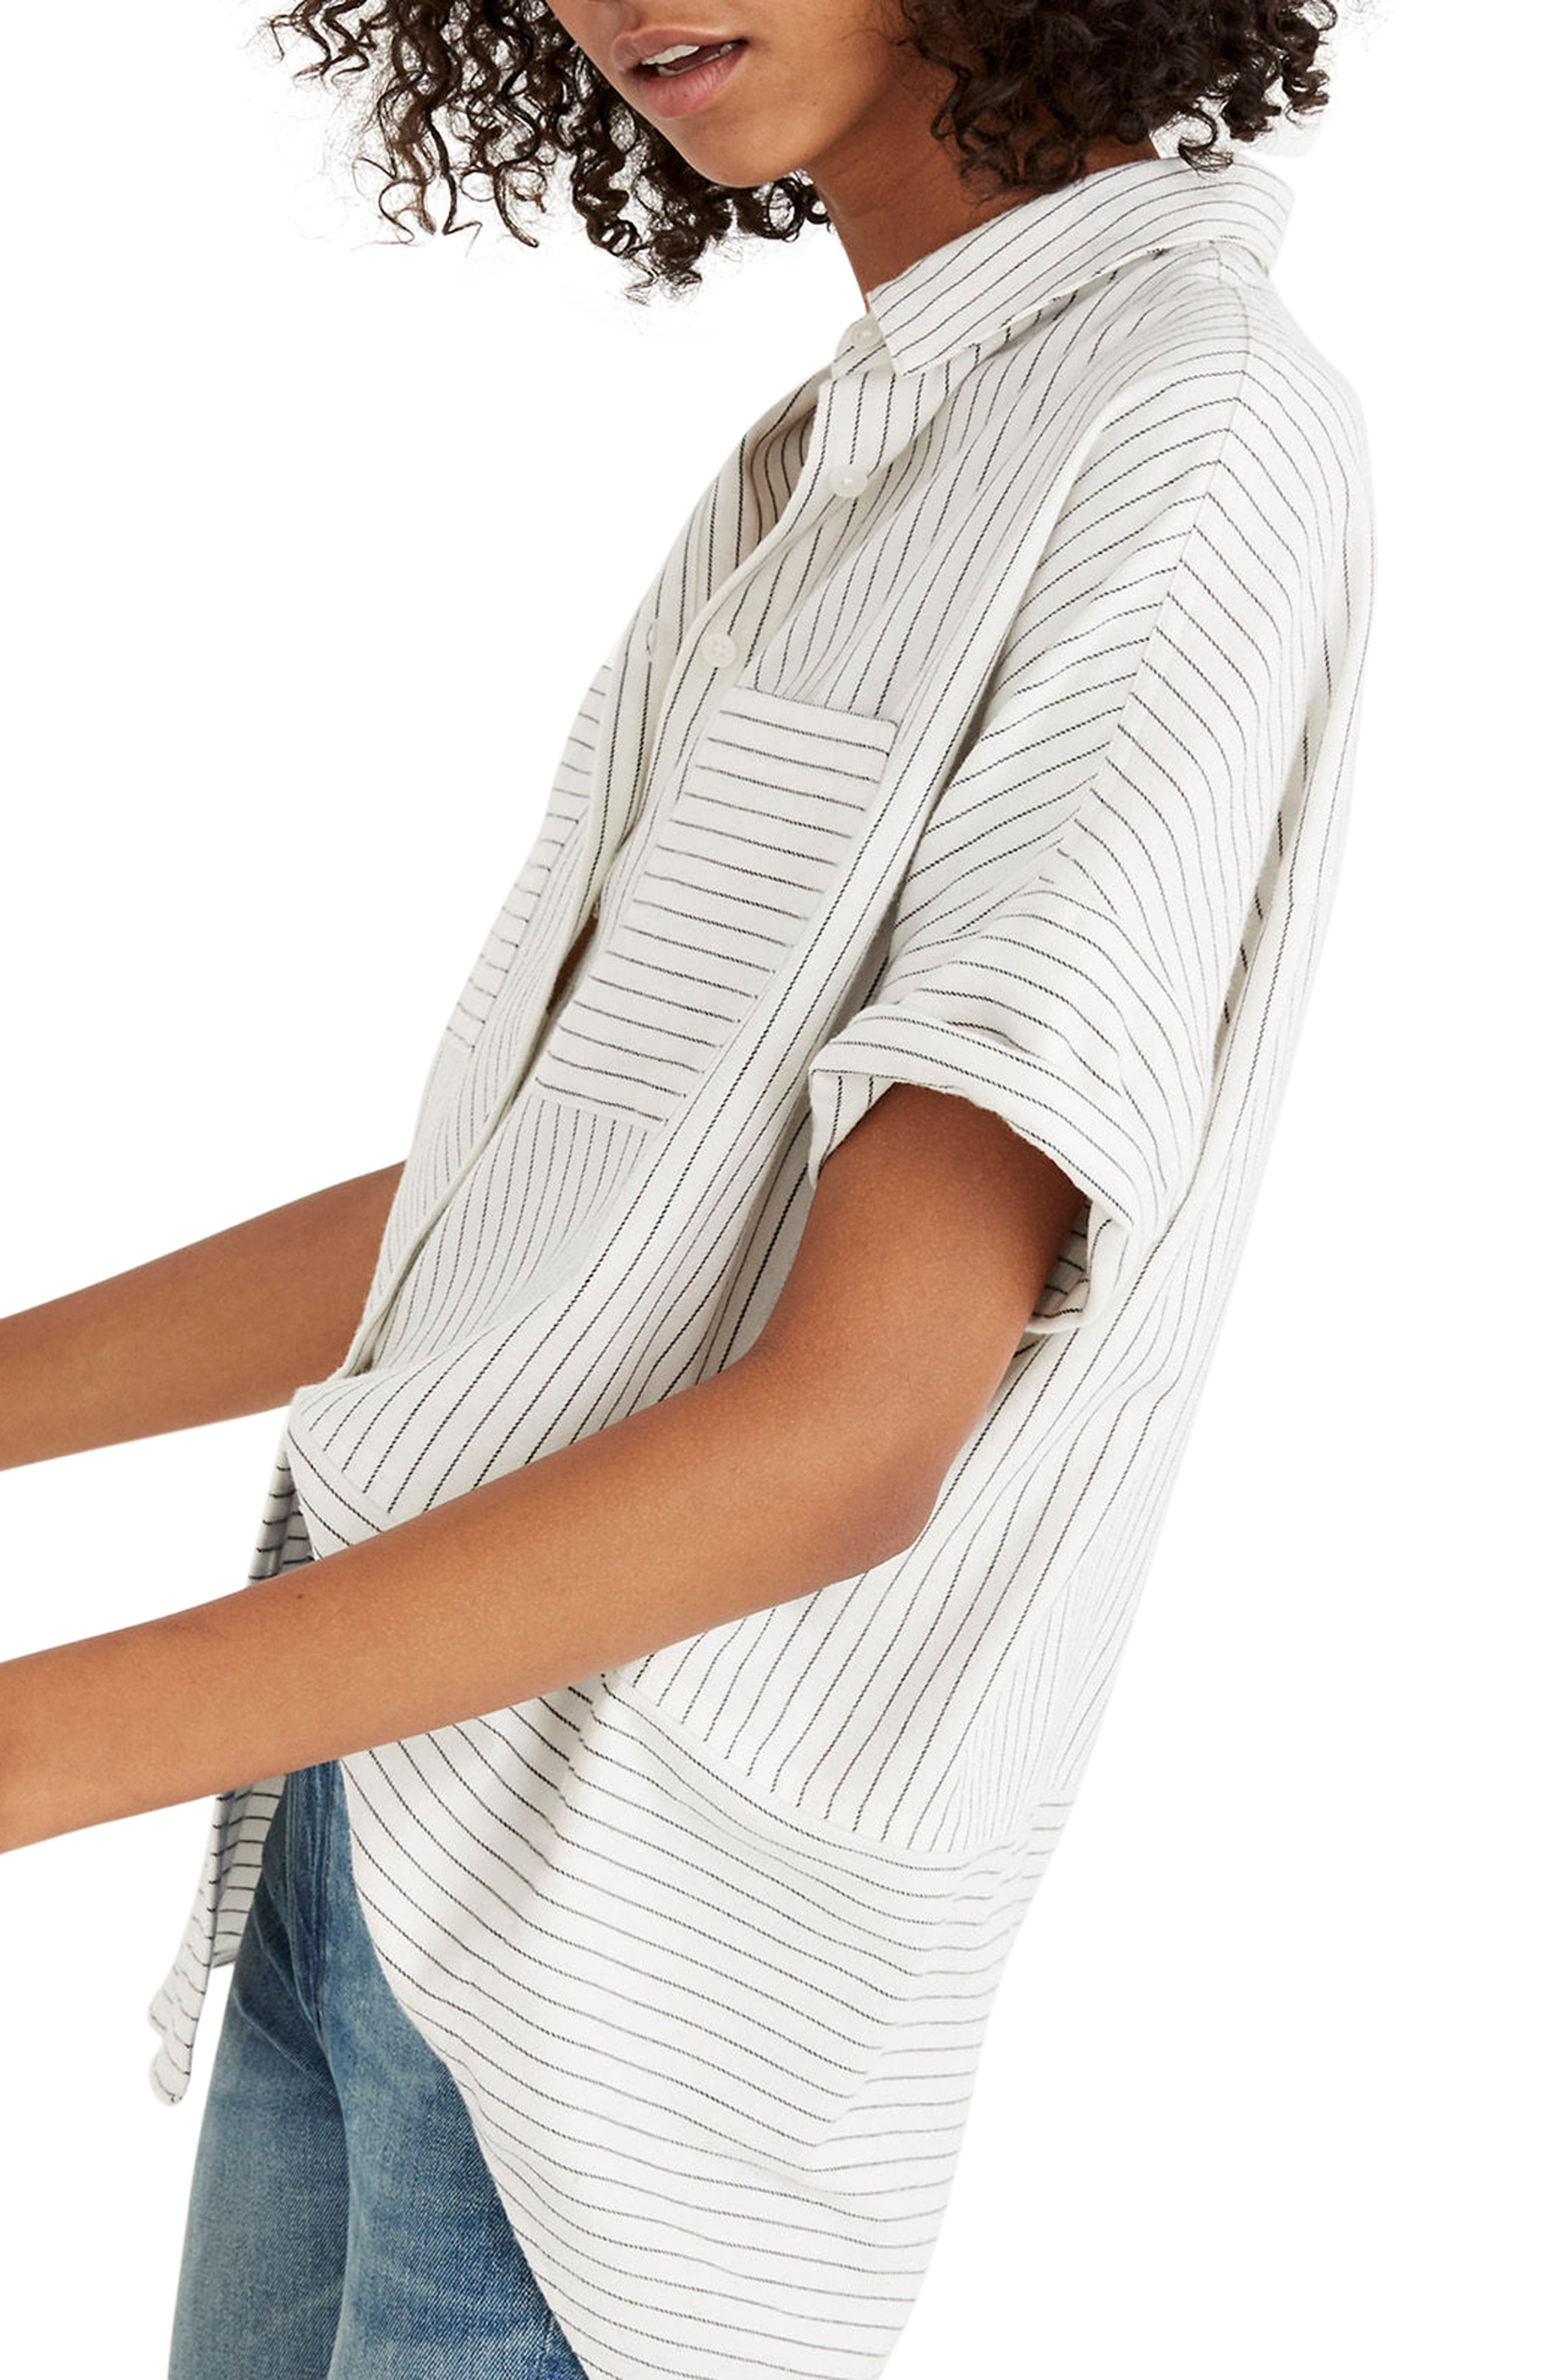 Flannel Courier Shirt,                             Alternate thumbnail 3, color,                             Bright Ivory Jones Stripe